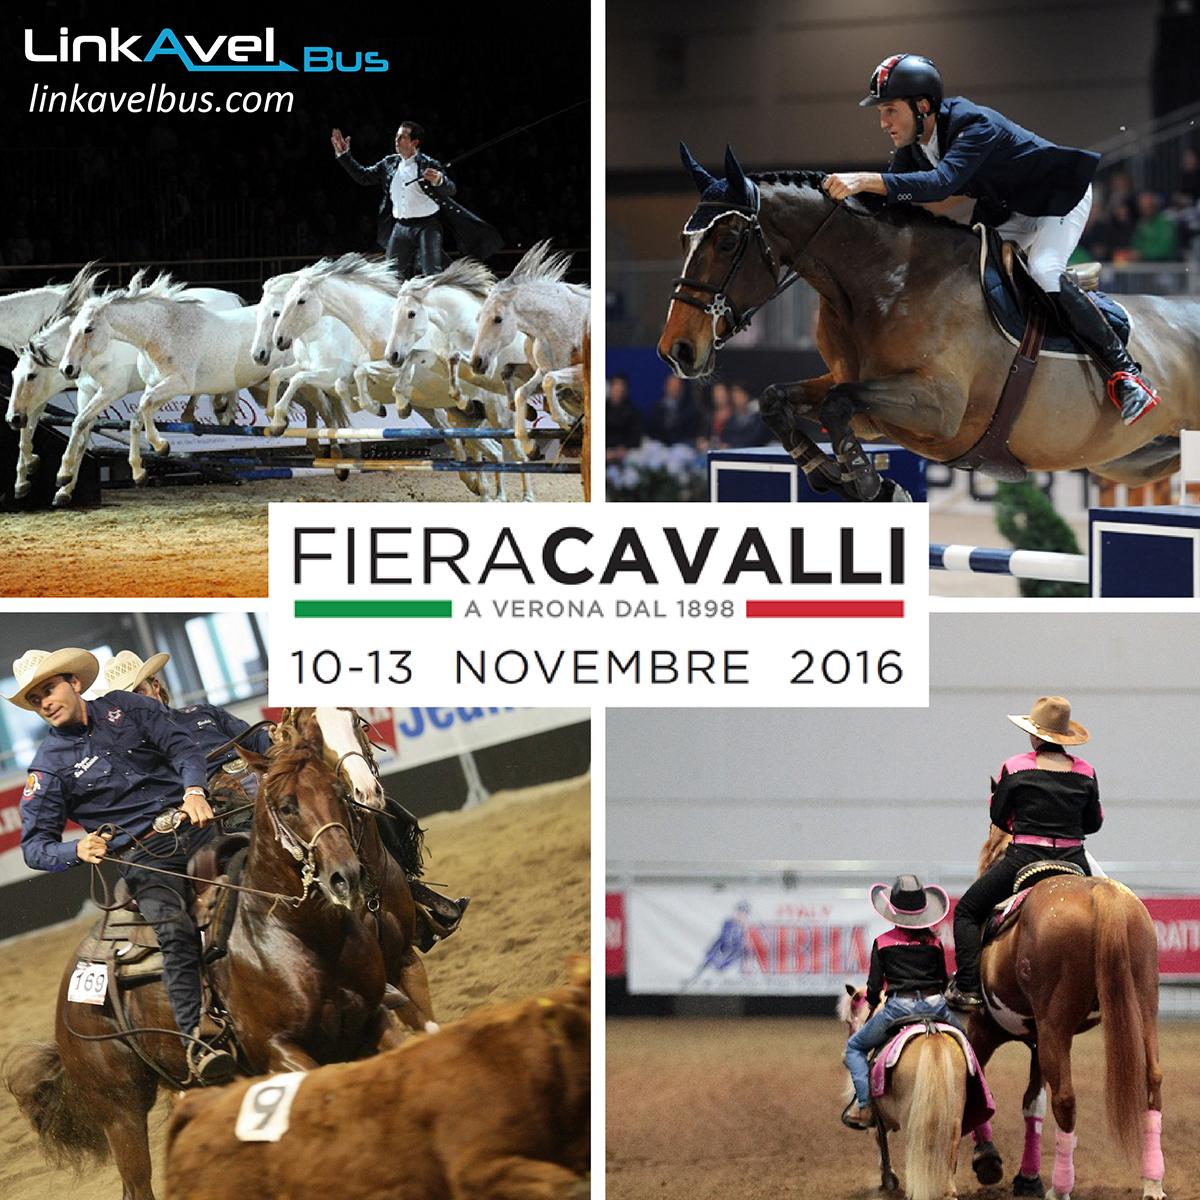 Fiera Cavalli Verona 2016 | 10-13 Novembre | LinkAvel